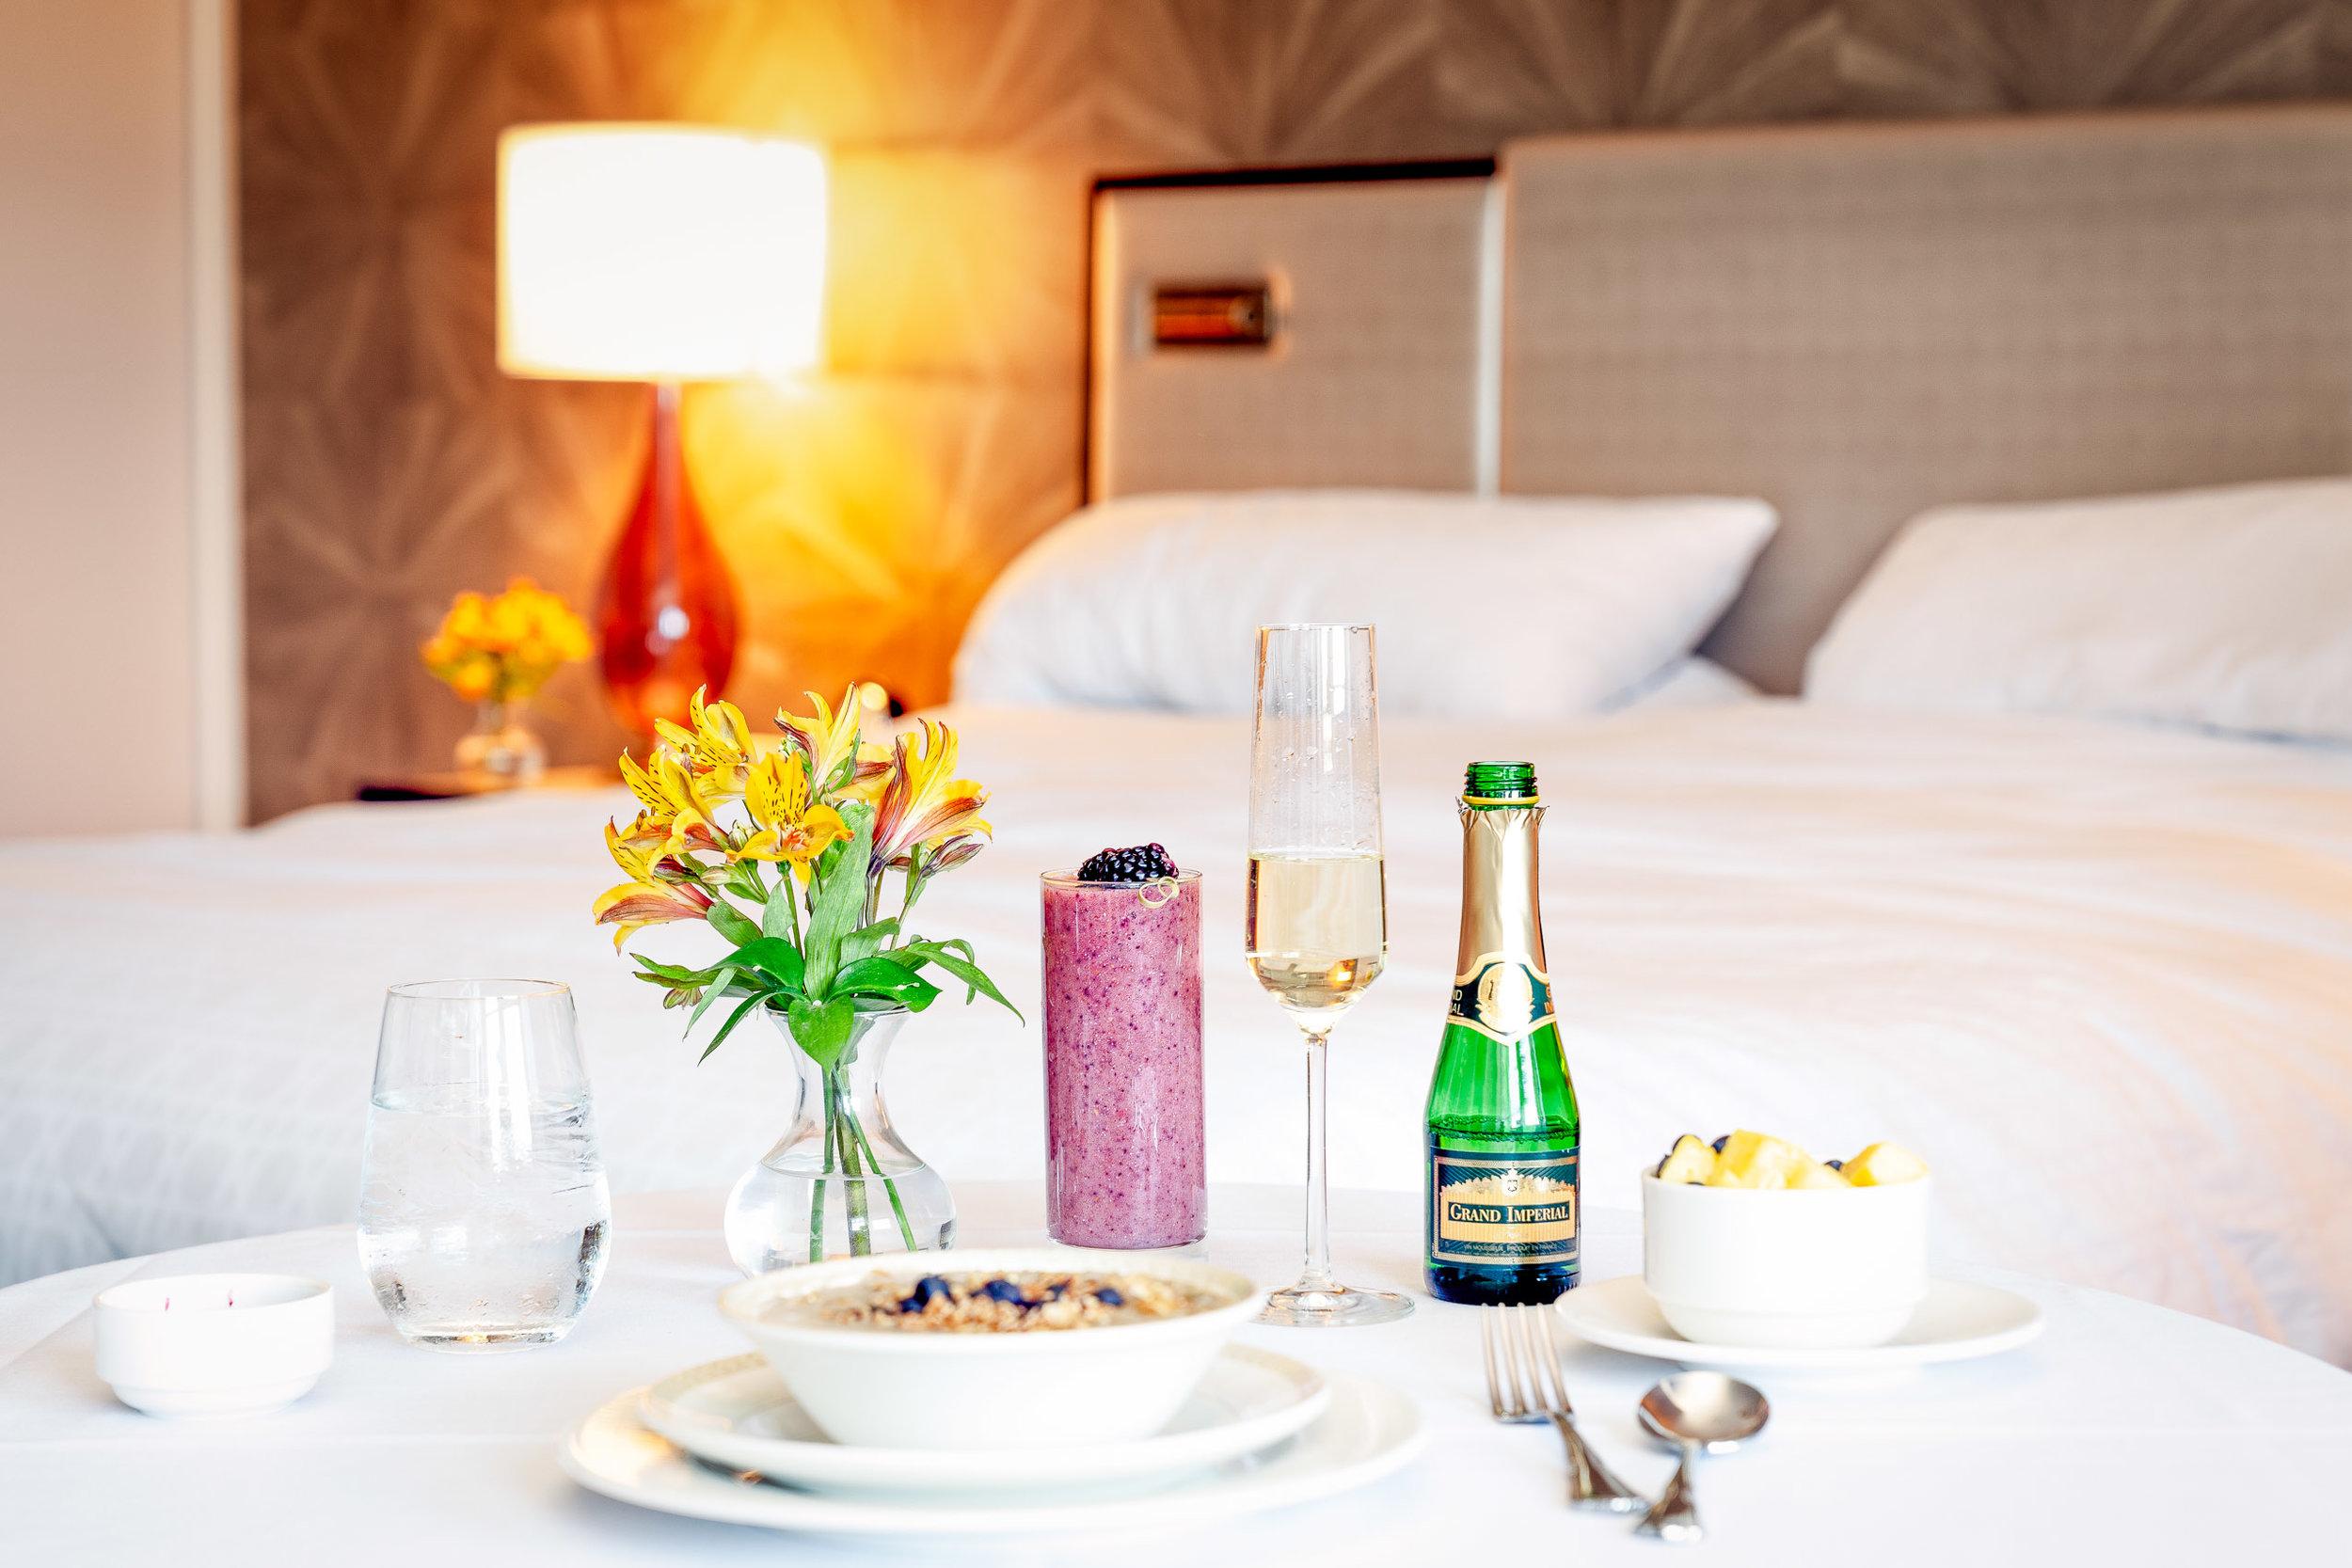 claremont-hotel-berkeley-14.jpg